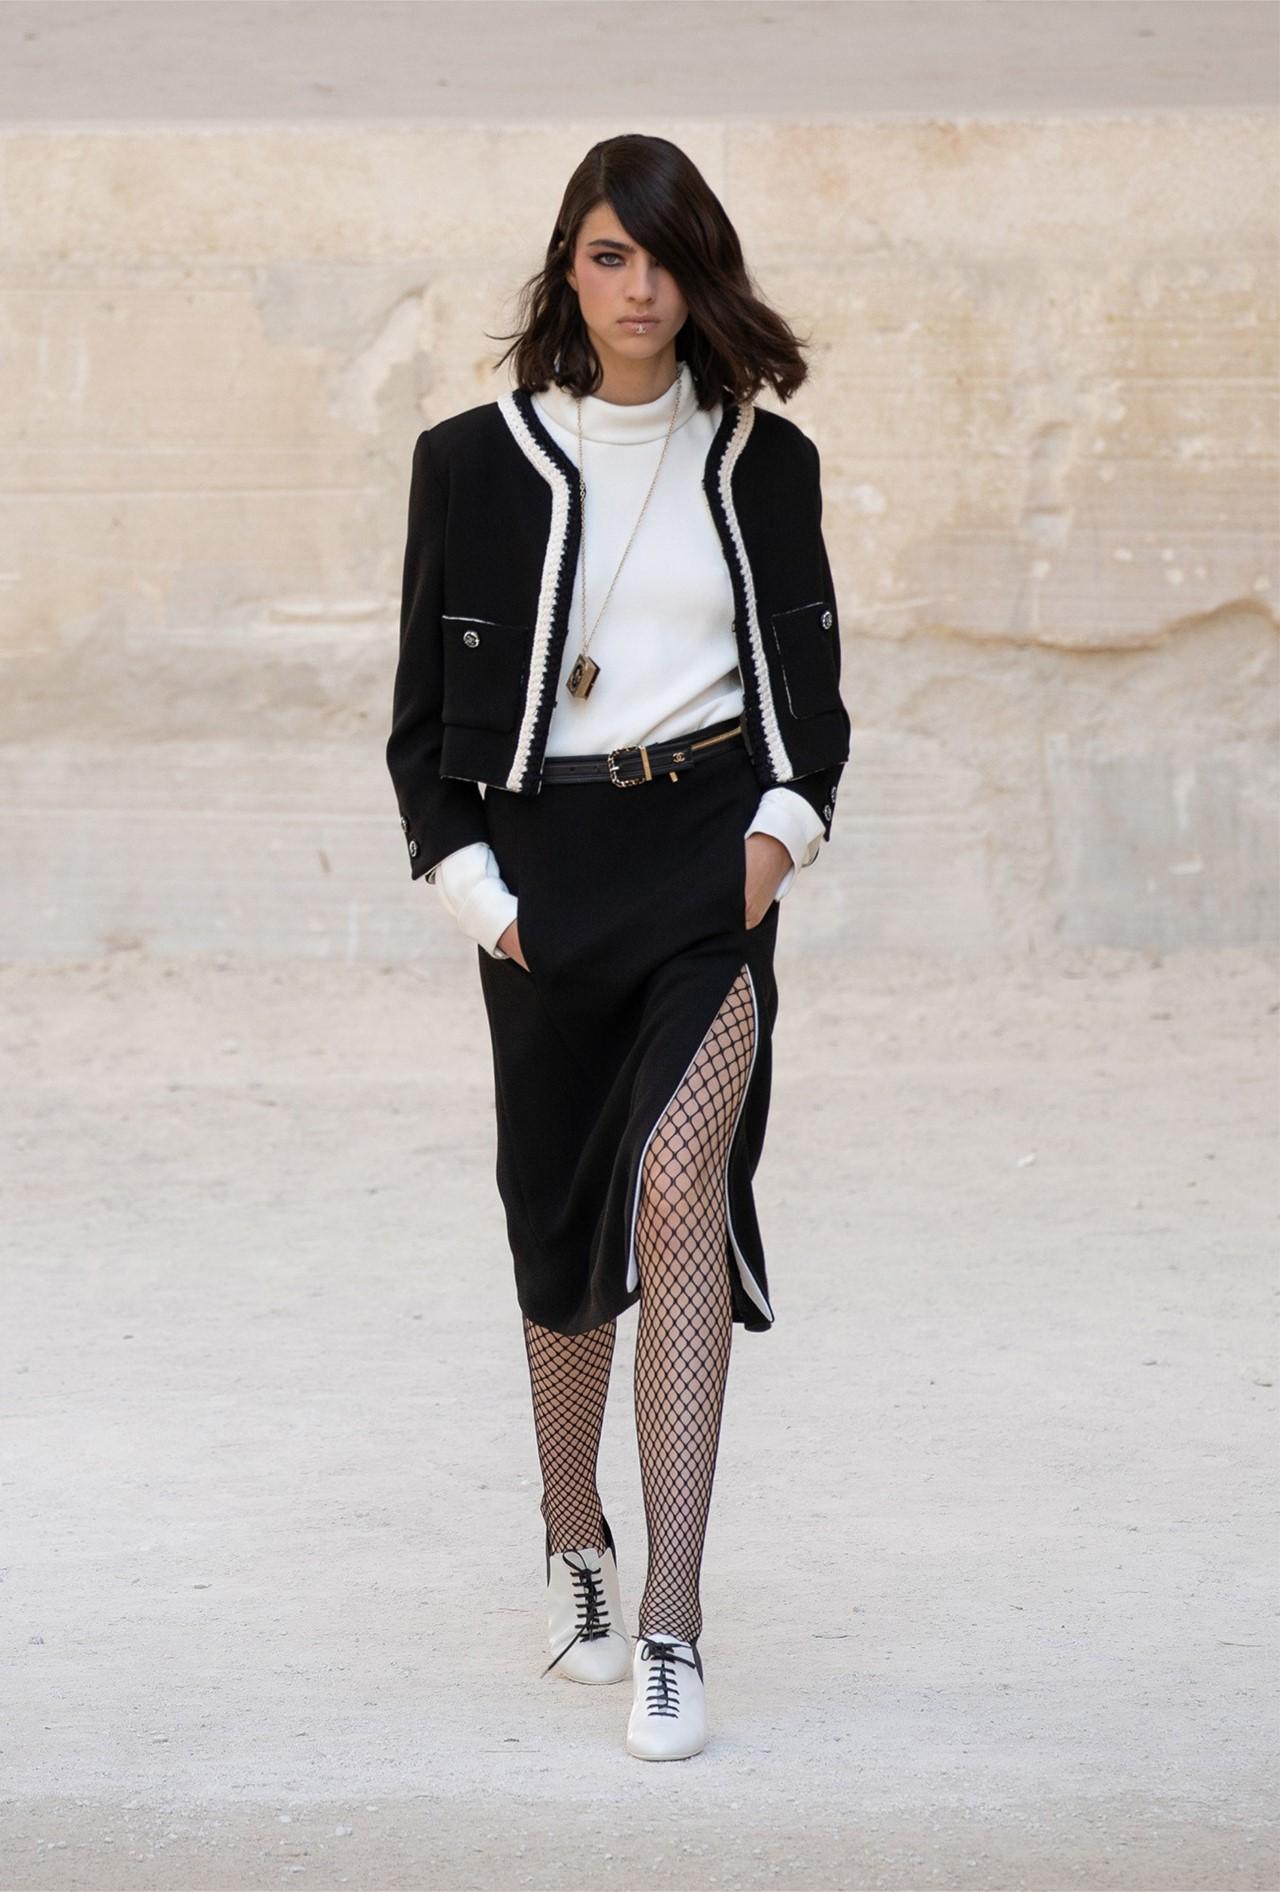 Chanel_Cruise_2022_Fashionela (4)